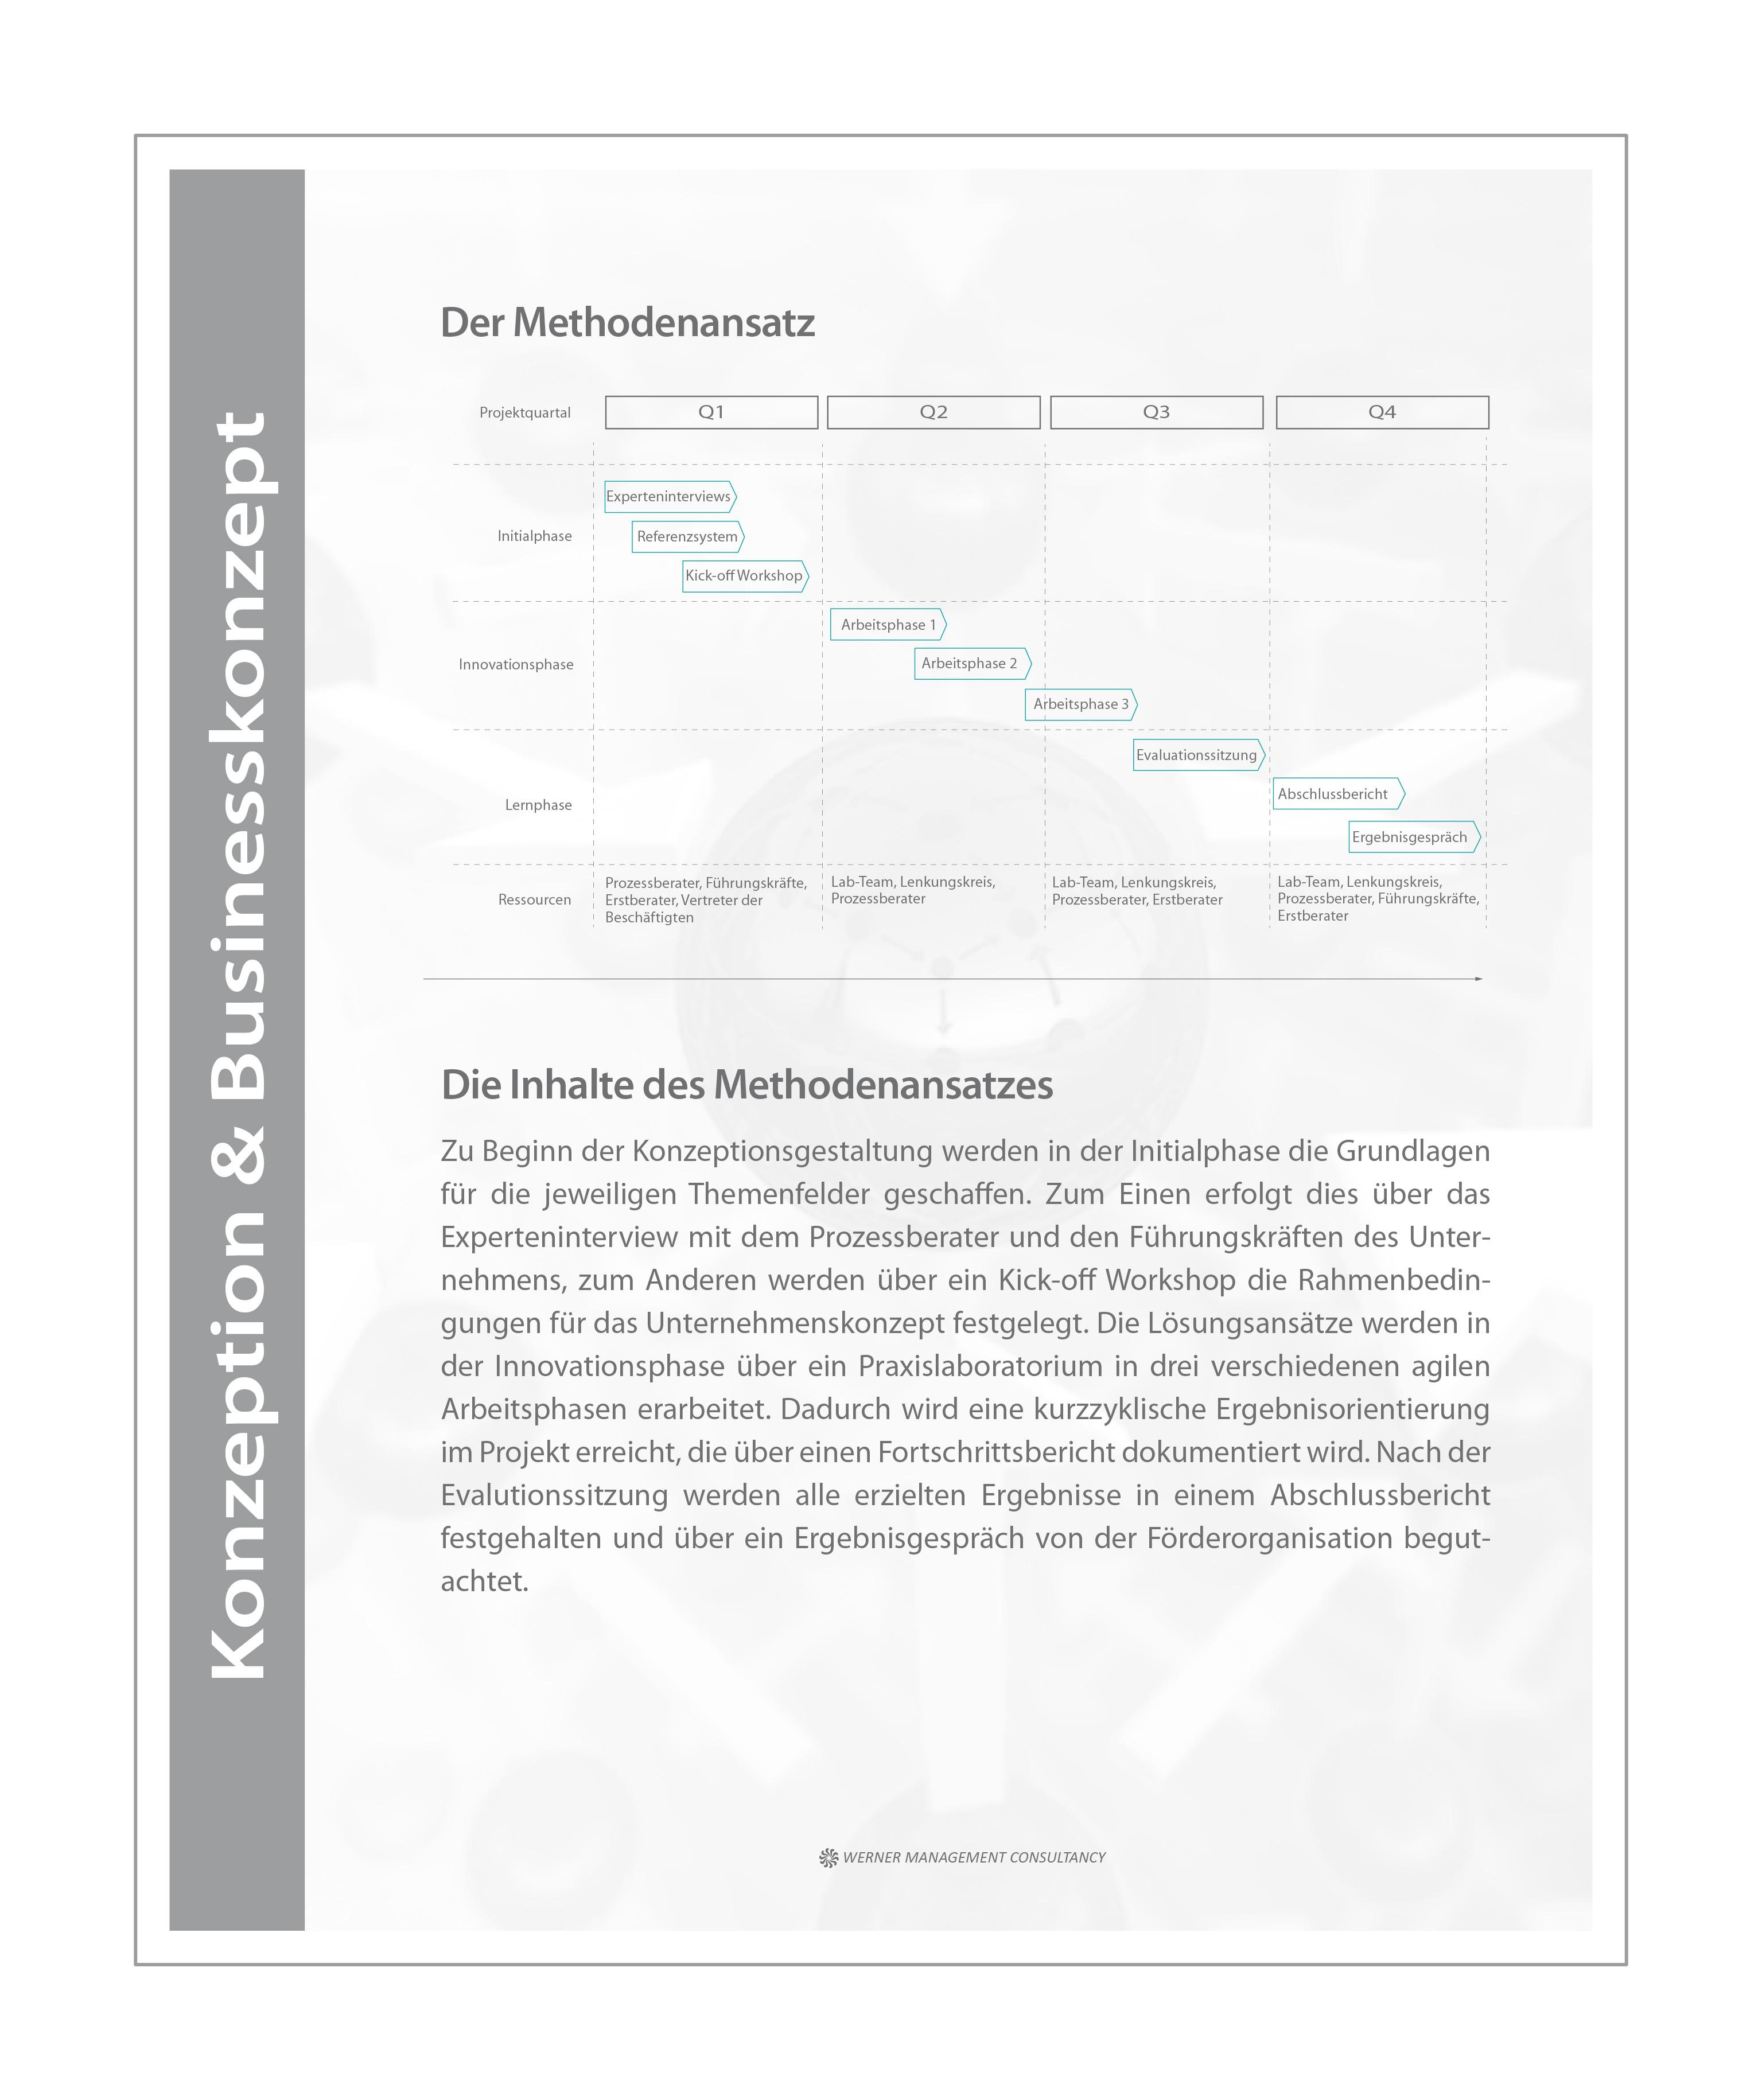 WMC Broschüre Business Development Phase-3 Methode